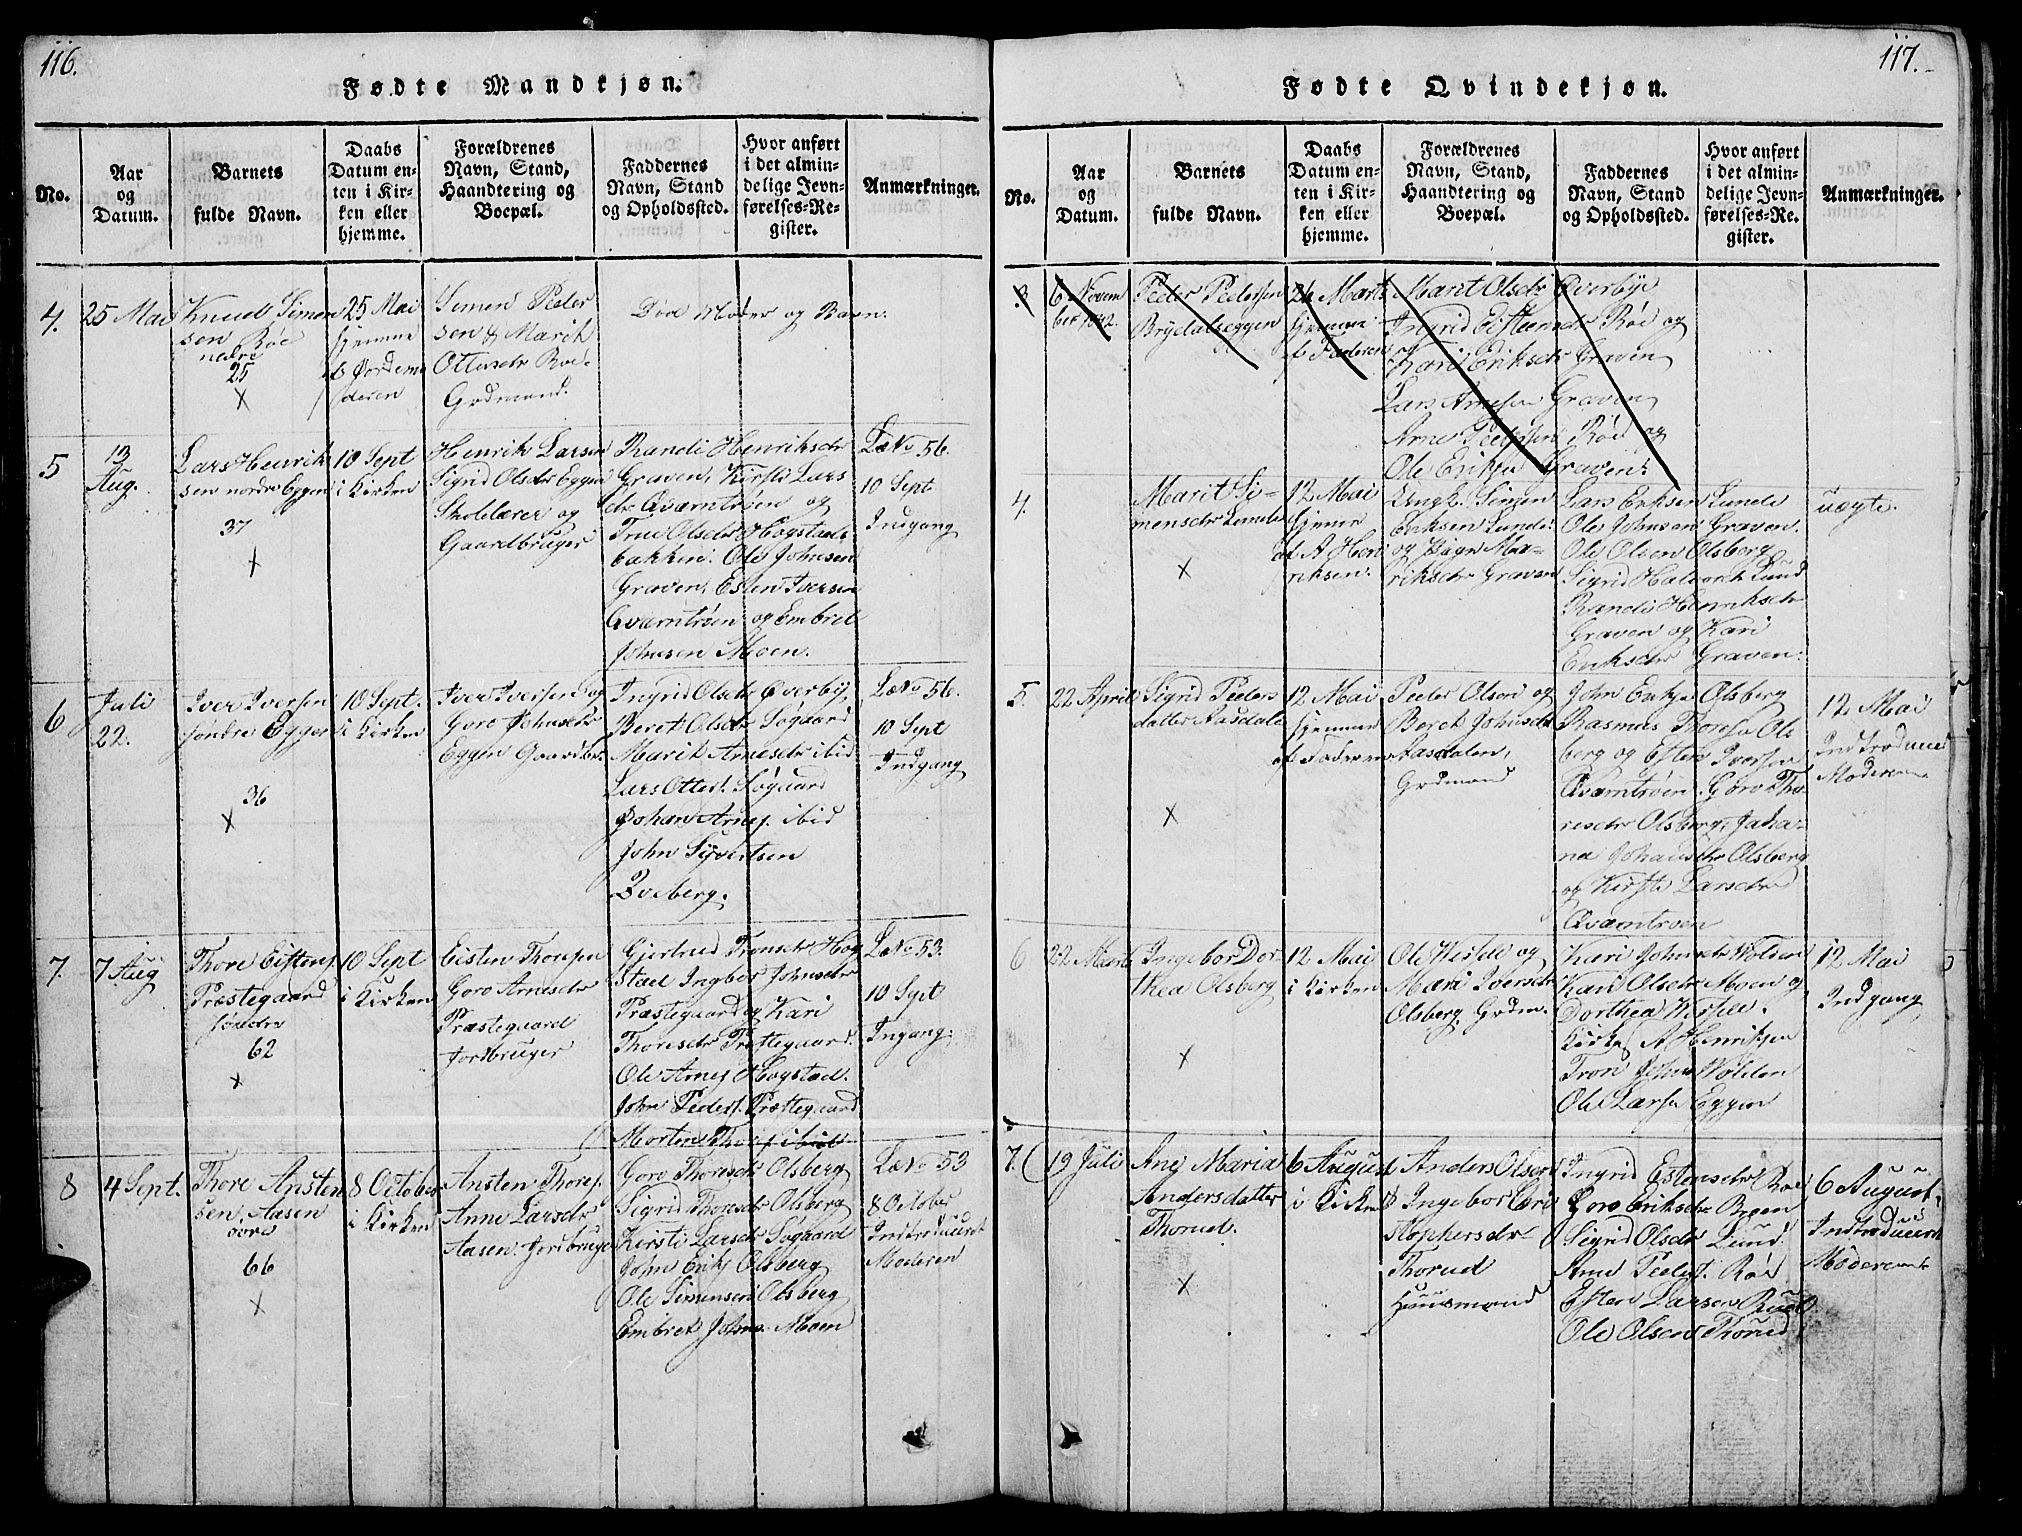 SAH, Tynset prestekontor, Klokkerbok nr. 4, 1814-1879, s. 116-117